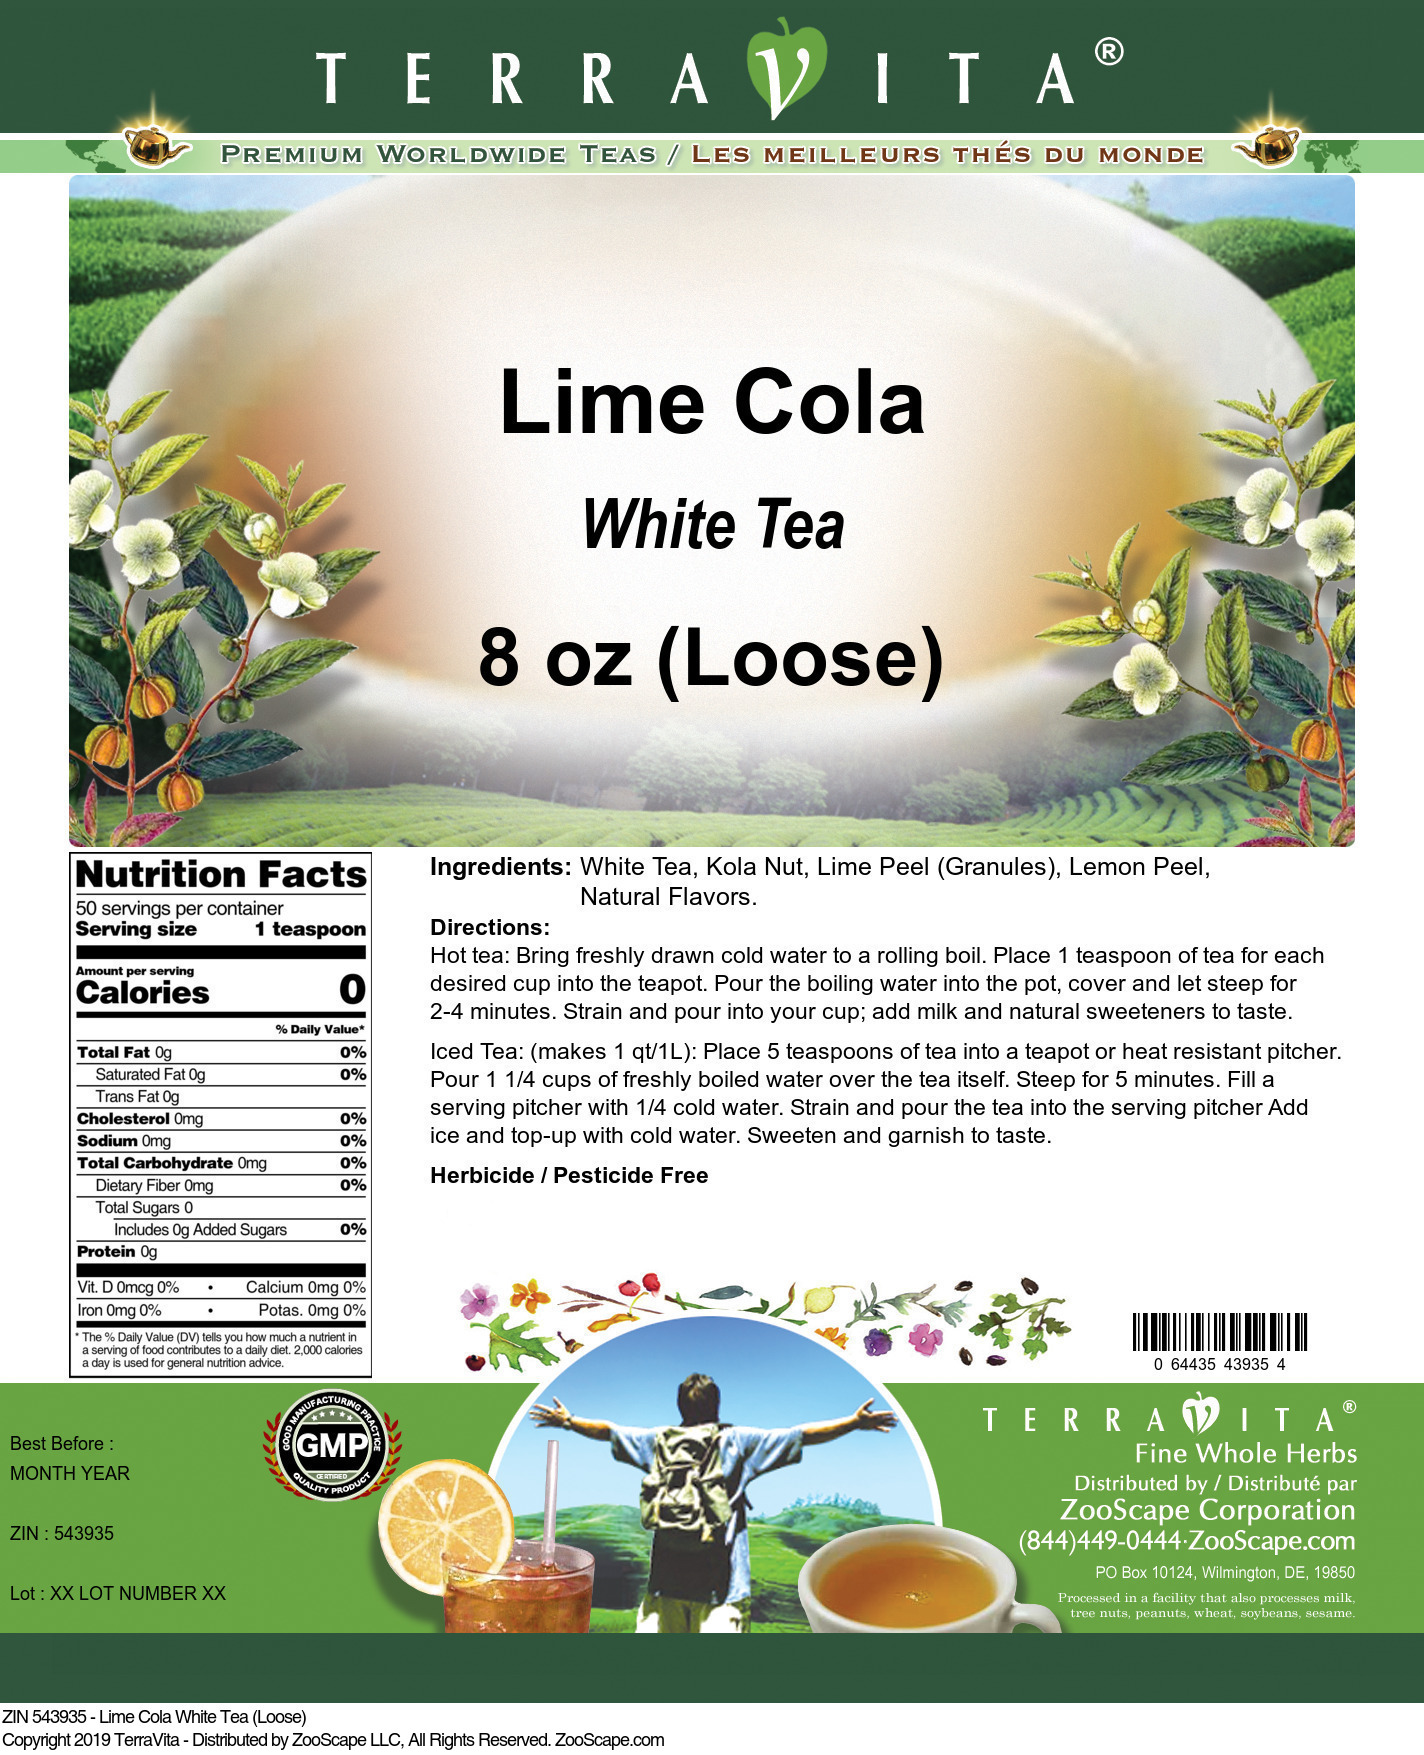 Lime Cola White Tea (Loose)